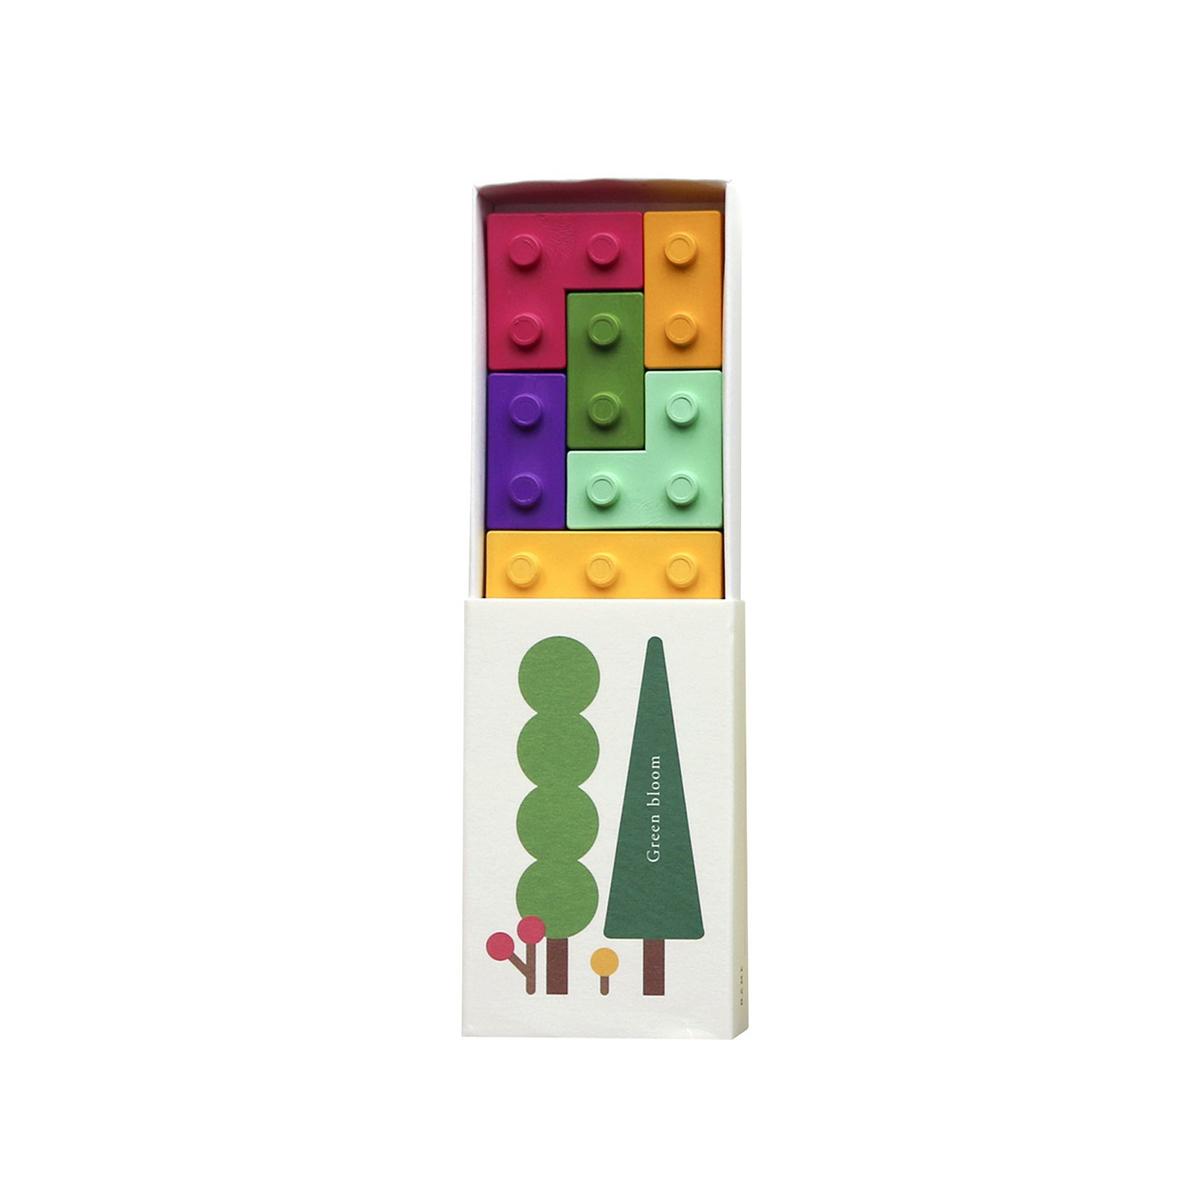 Green bloom crayon box